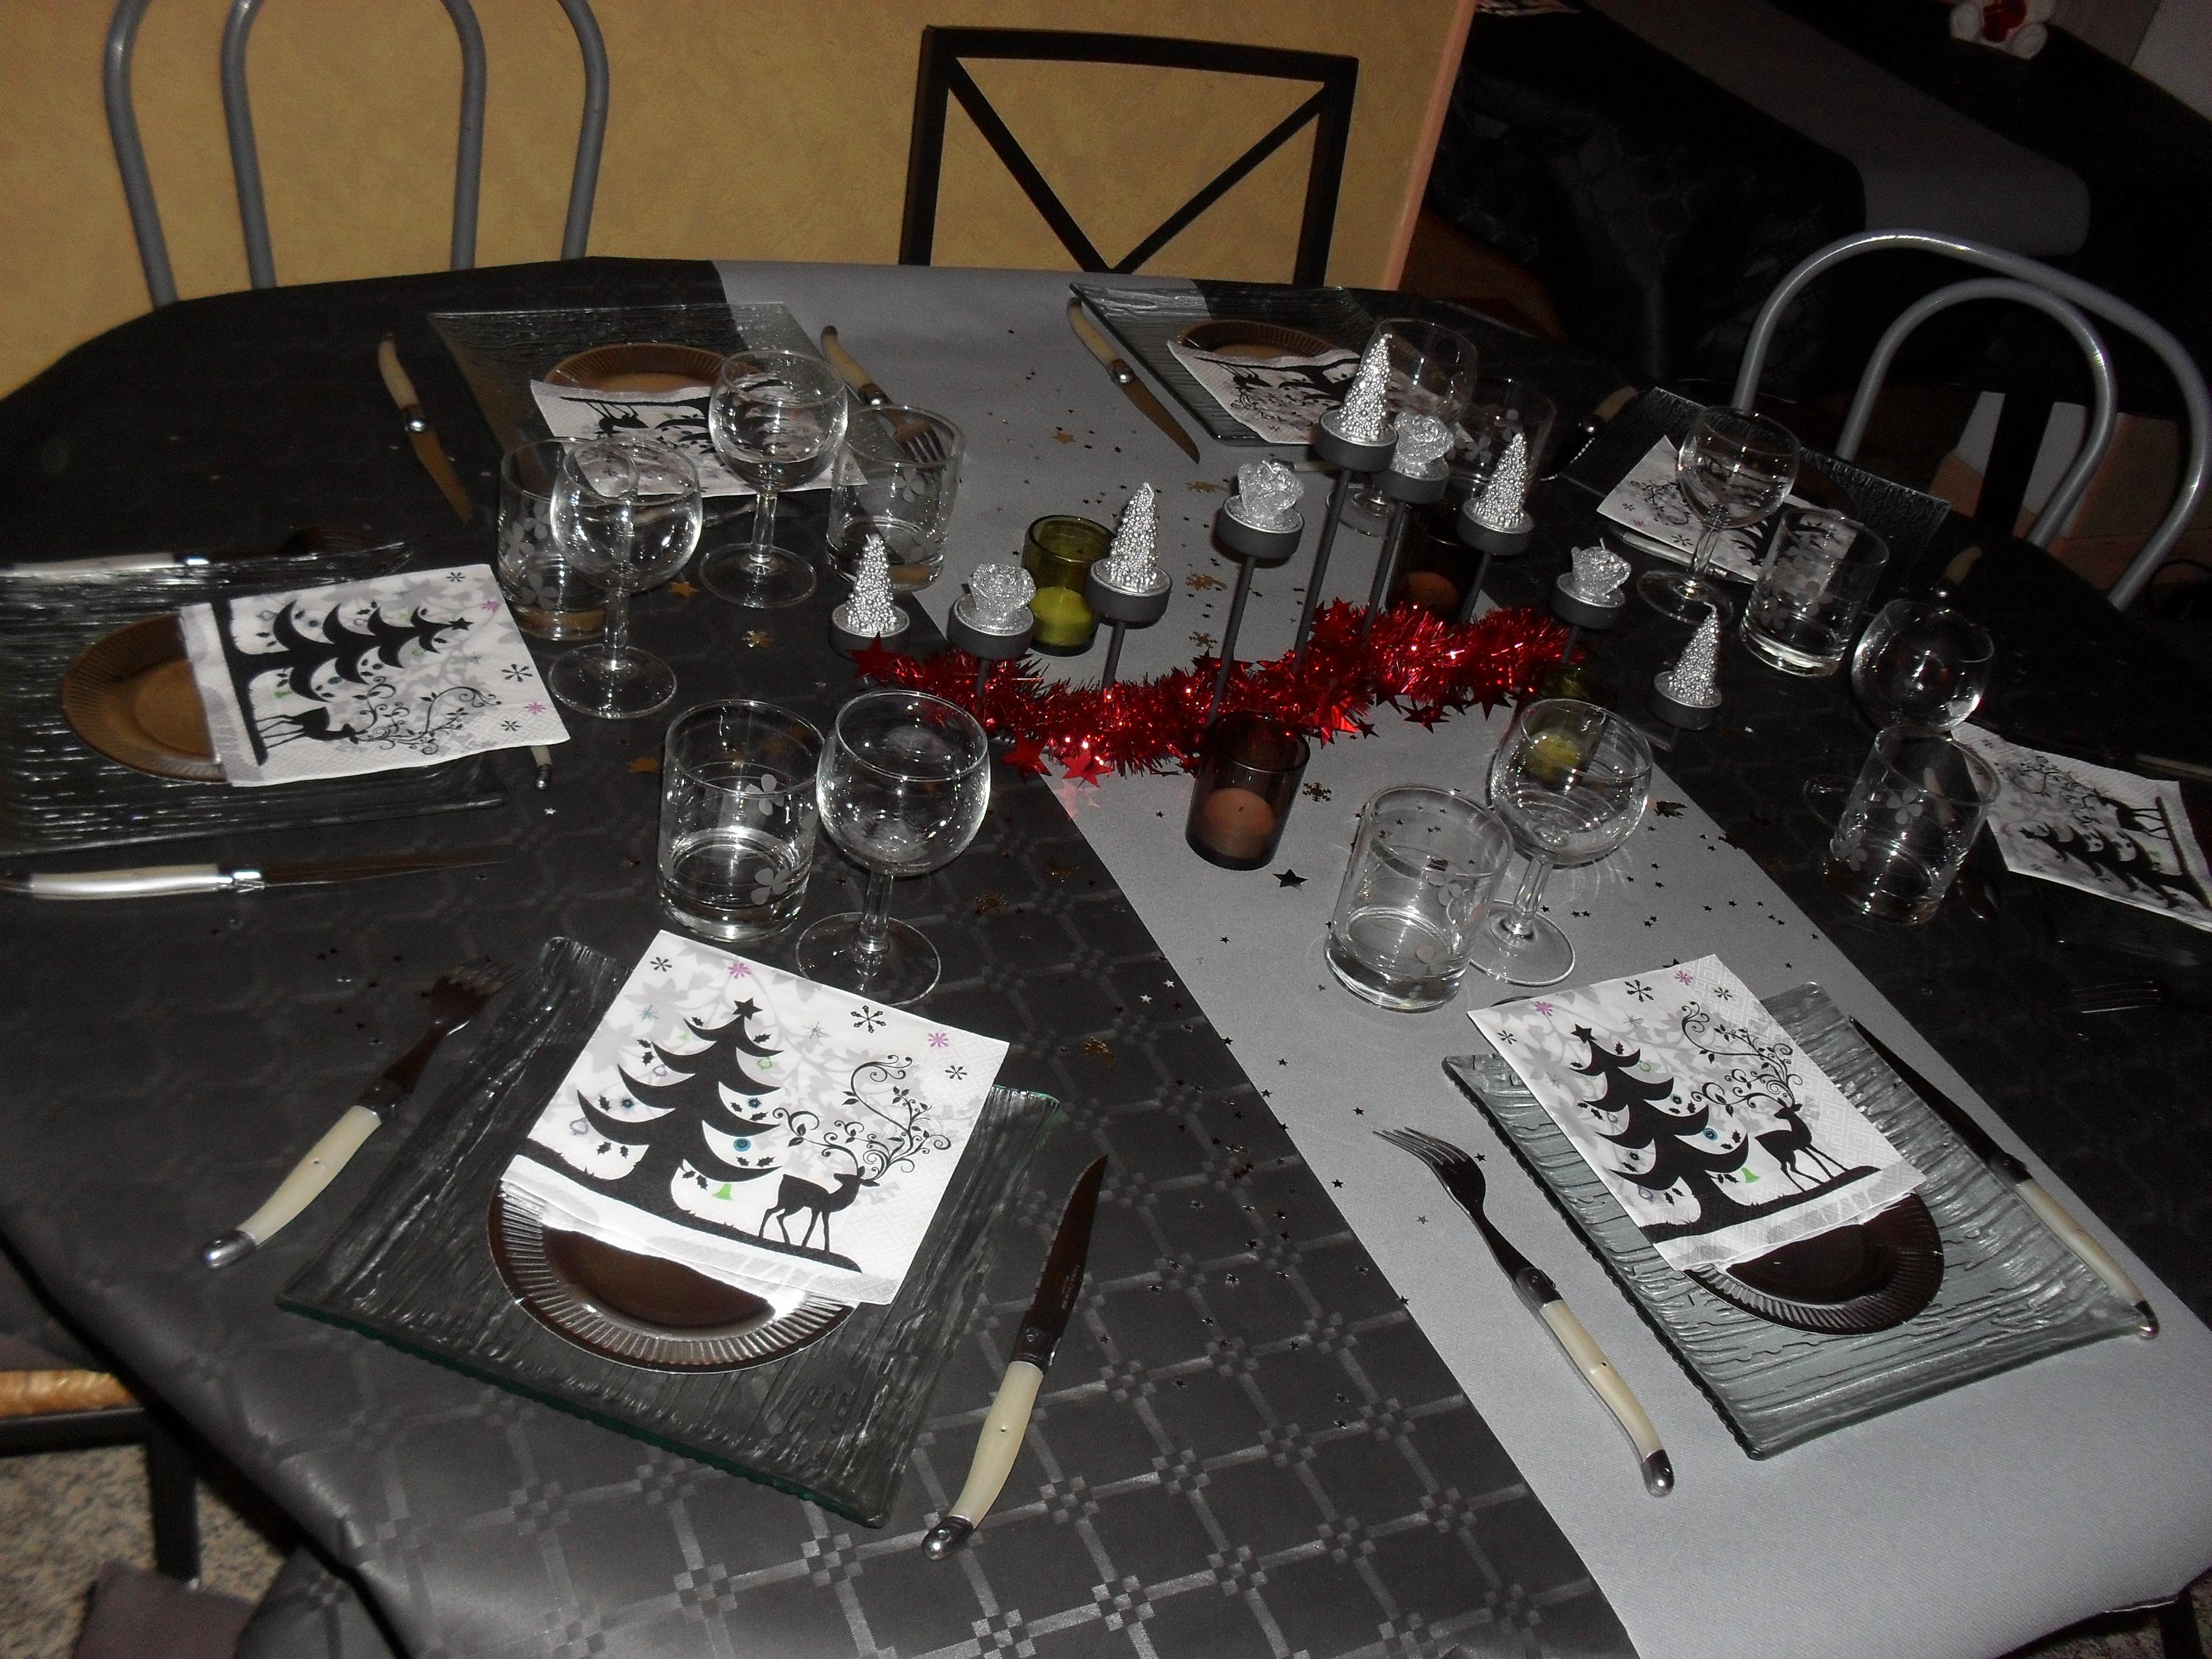 Nouvel an 2010 les d cos de table eloluca photos for Table nouvel an